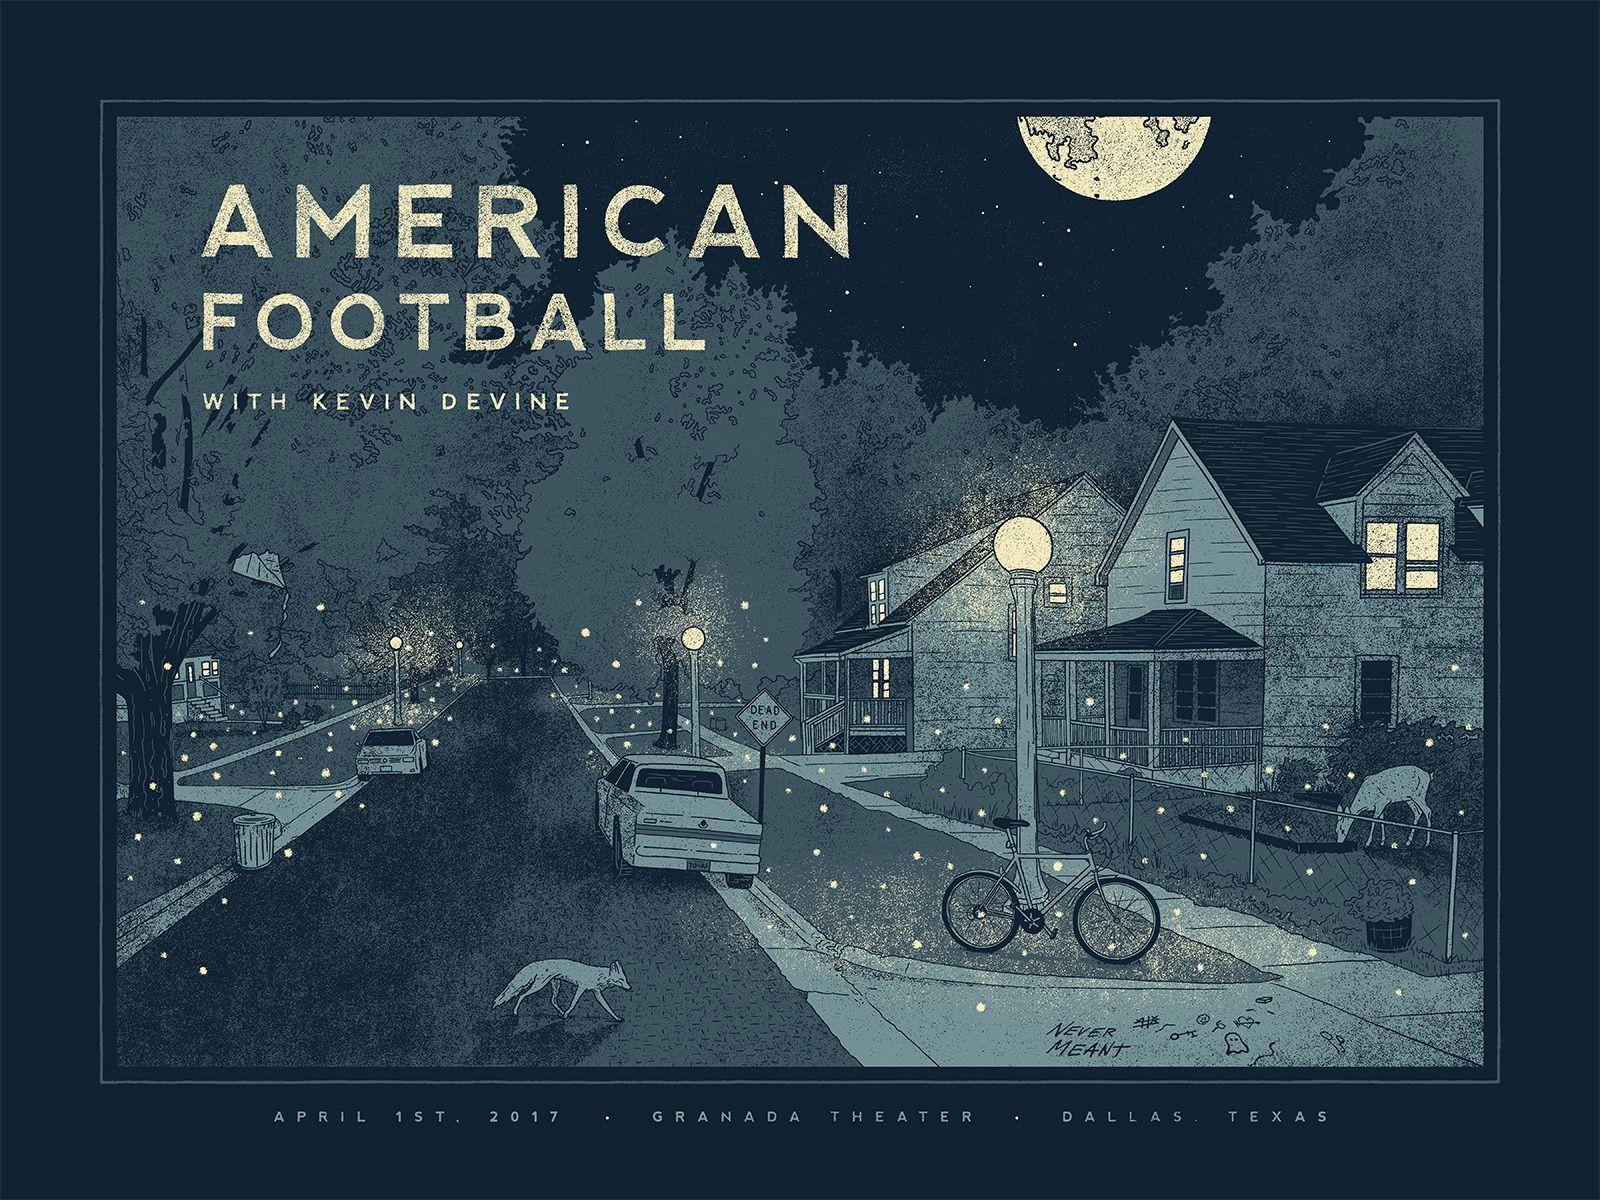 American Football Band Wallpaper Http Wallpapersalbum Com American Football Band Wallpaper Html In 2020 Football Poster Gig Posters American Football